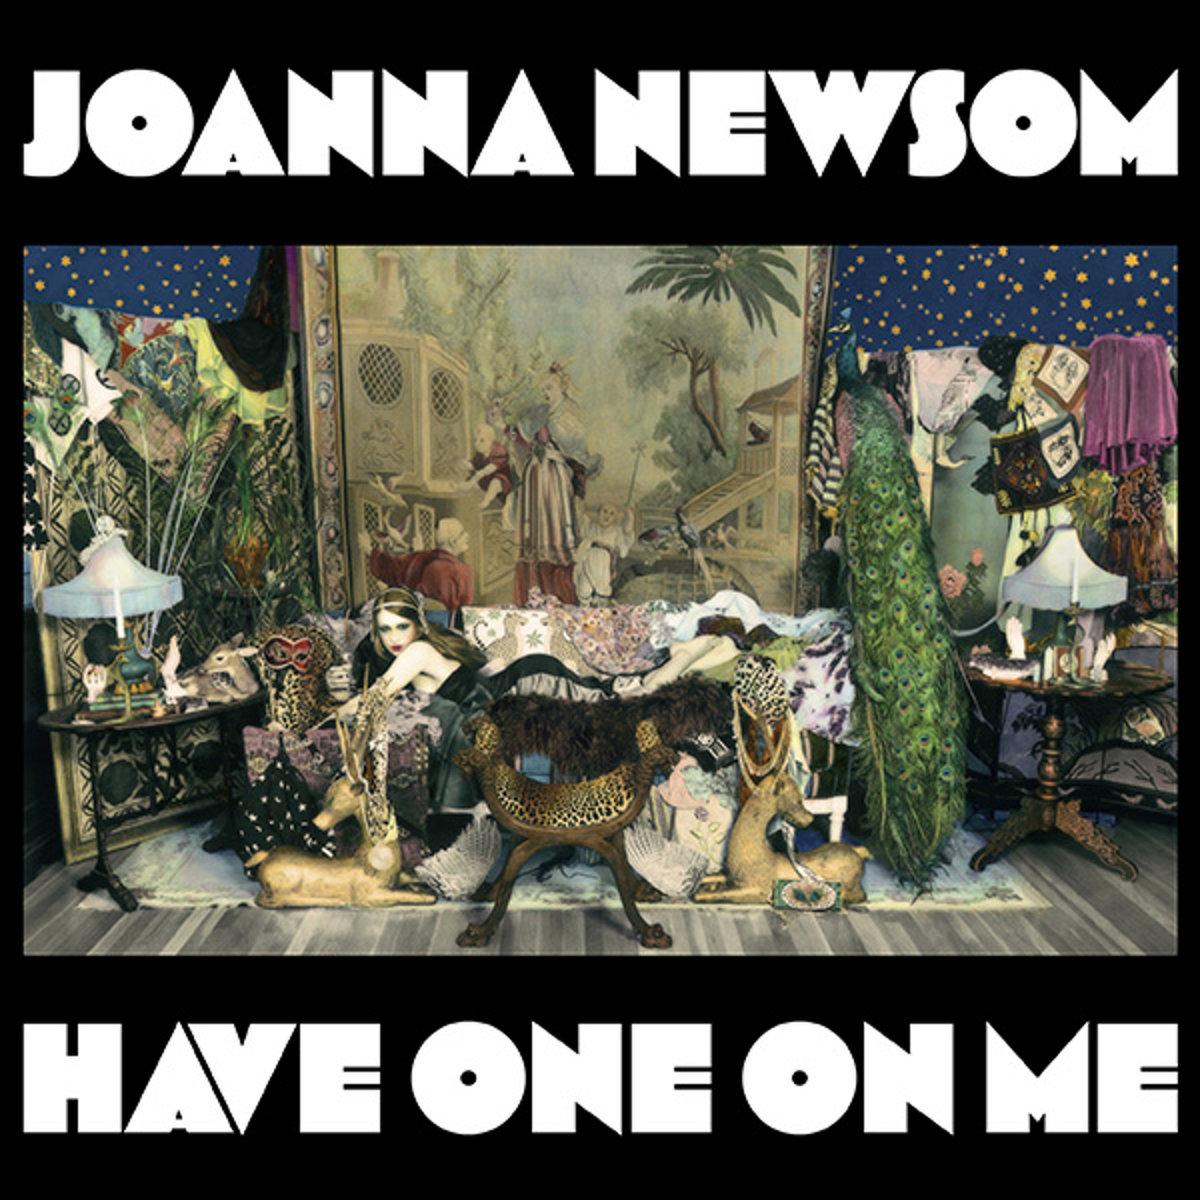 Joanna Newsom, Have One on Me